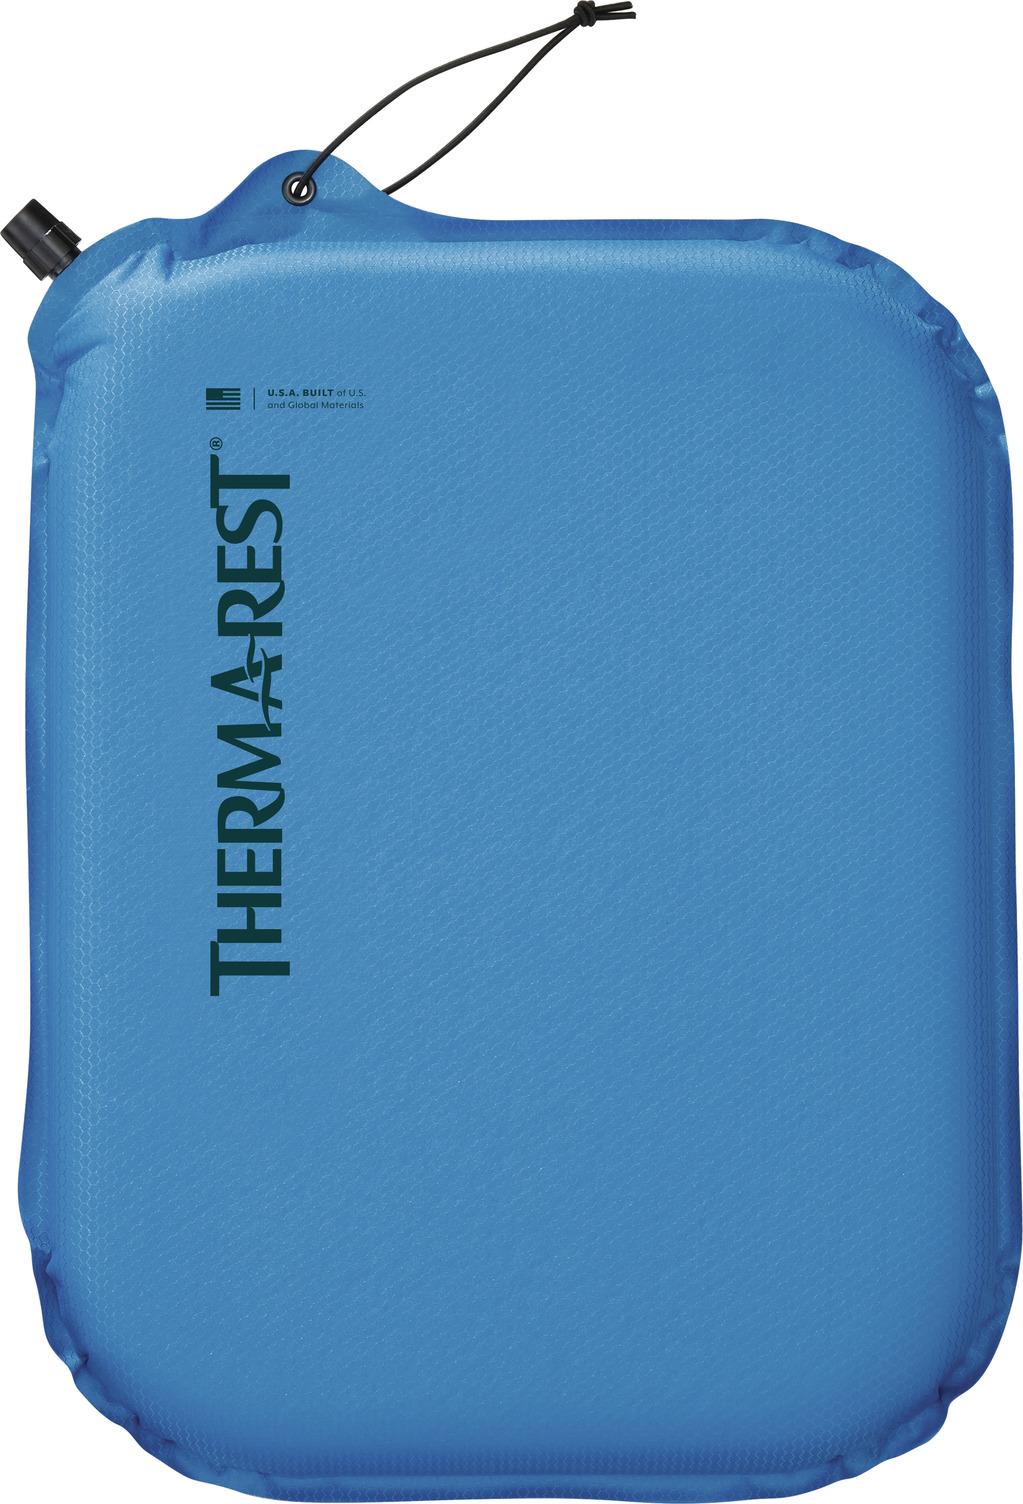 Thermarest Lite Seat blue